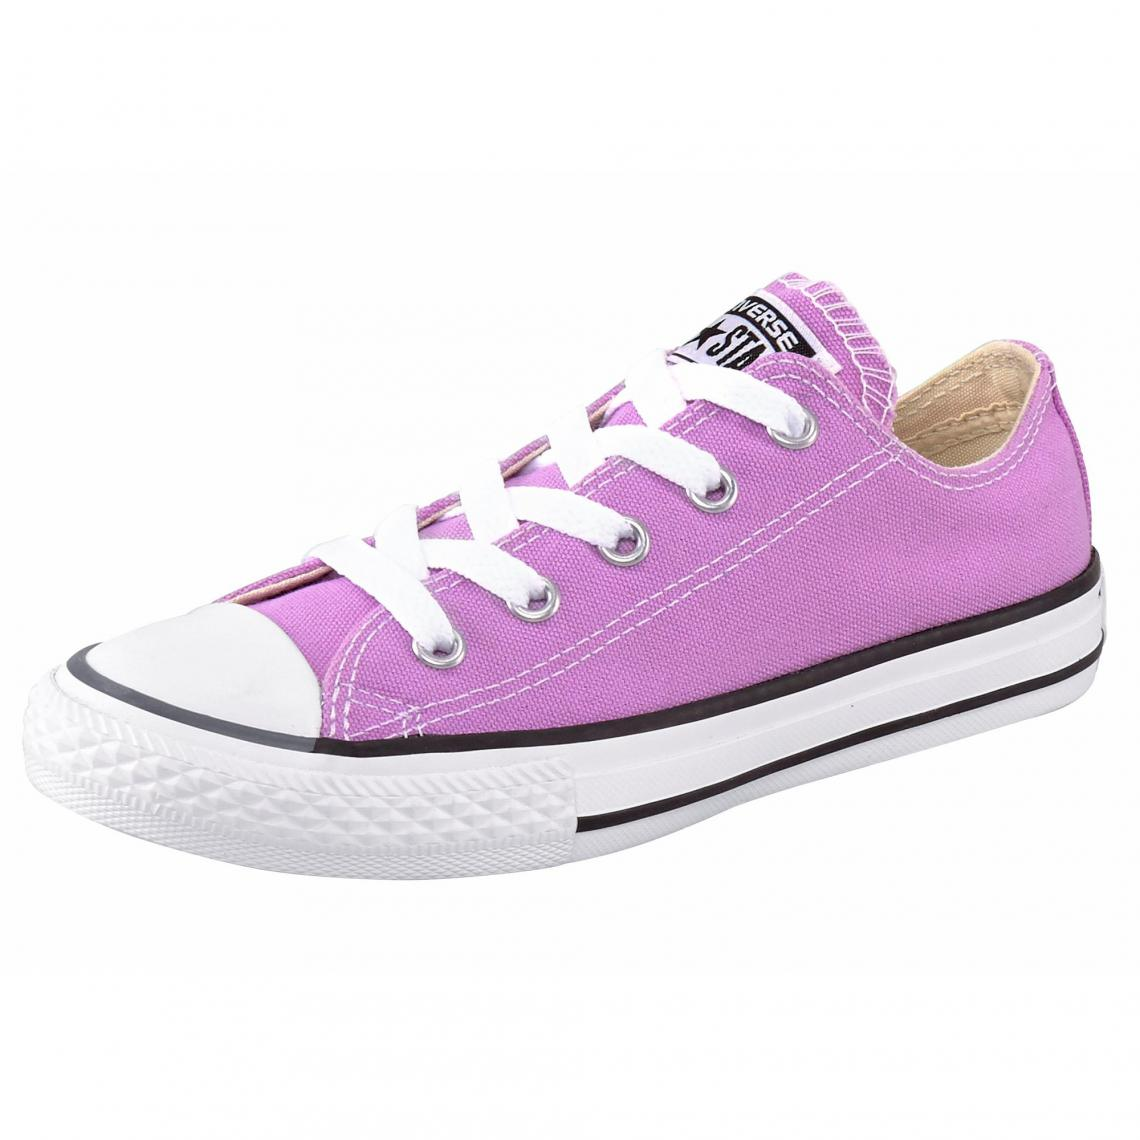 43f1f145a1a28 Converse Chuck Taylor All Star Ox sneakers basses en toile - Rose Converse  Enfant